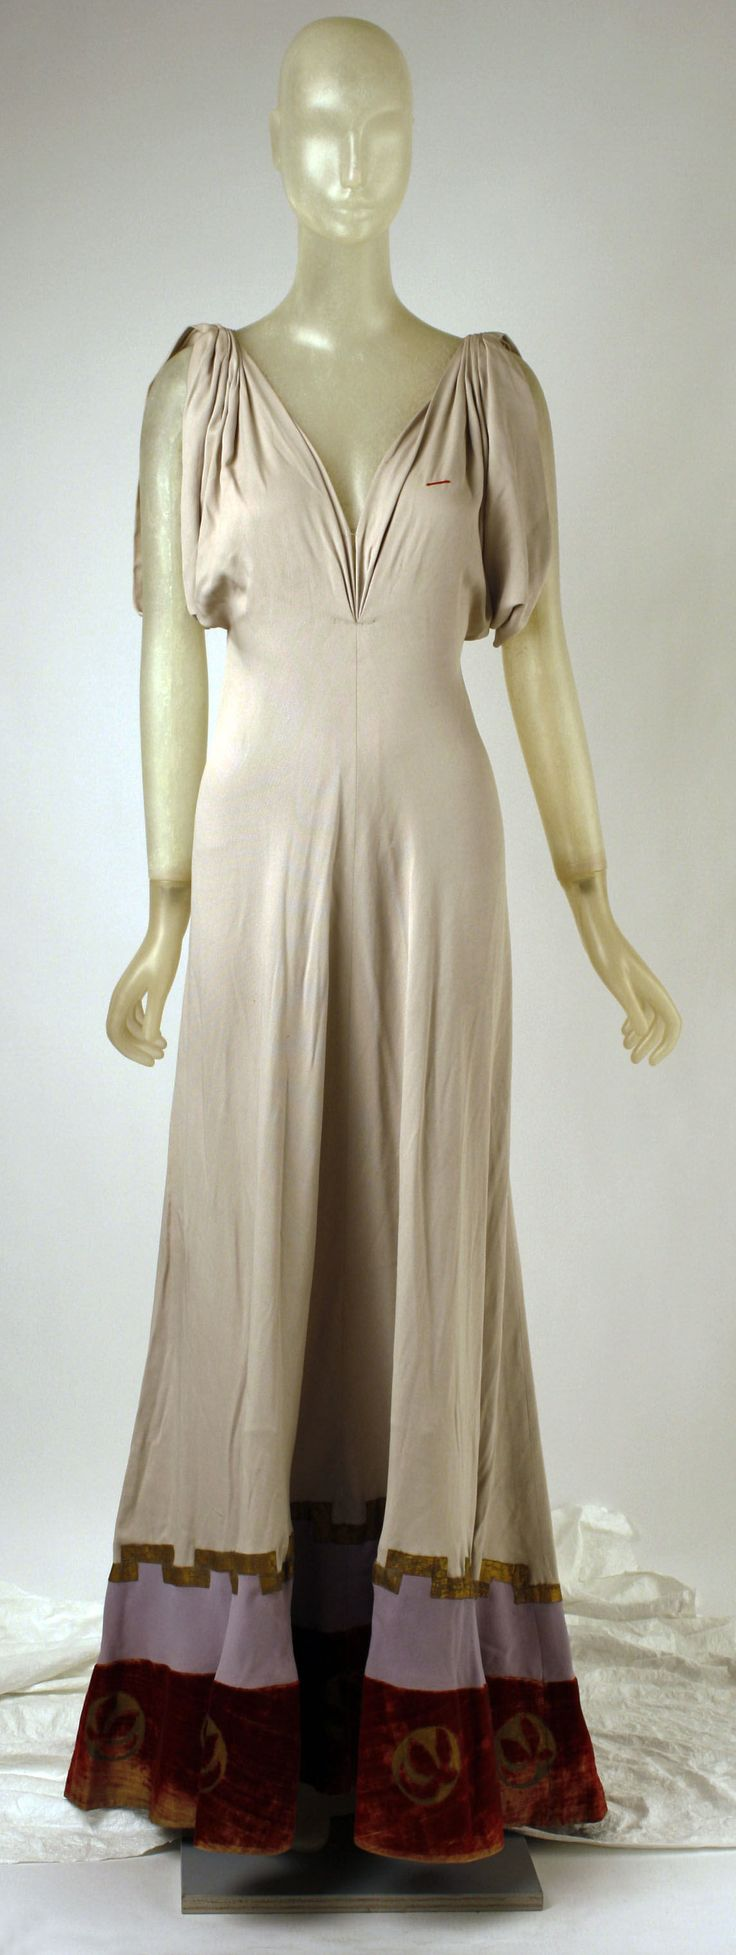 Evening Dress, Madeleine Vionnet (French, Chilleurs-aux-Bois 1876–1975 Paris): 1938, French, silk, metal.